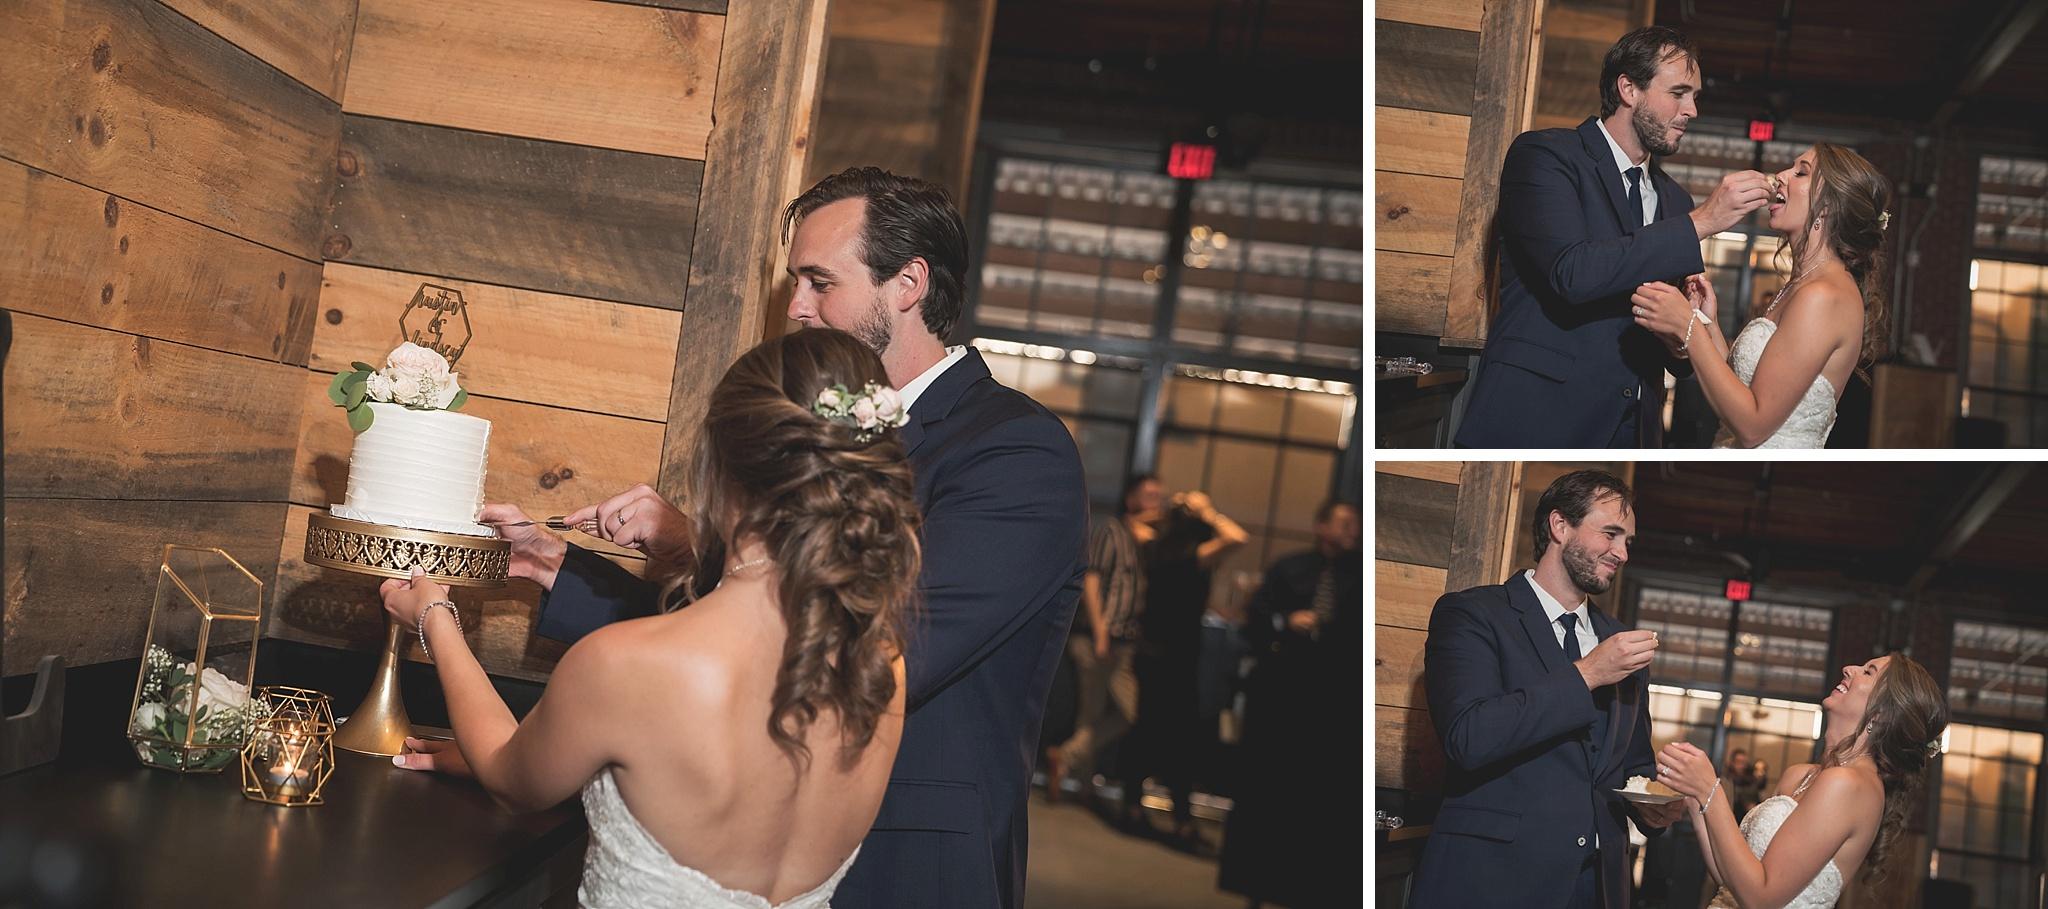 Rickhouse-Durham-NC-Wedding-Photographer-065.jpg